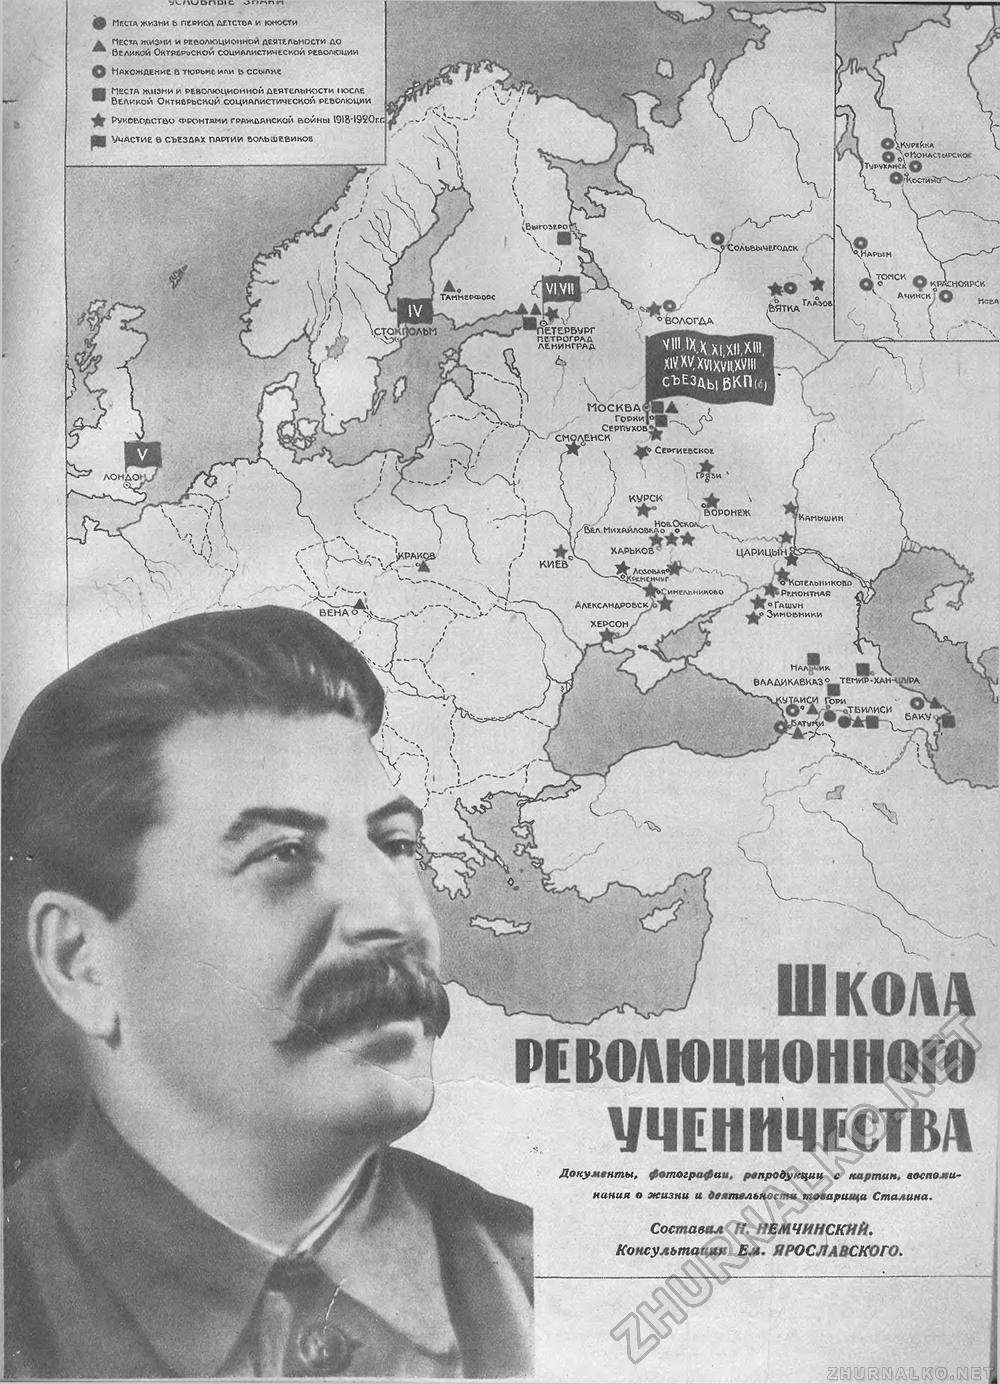 Чем занимался Сталин до 1917 года